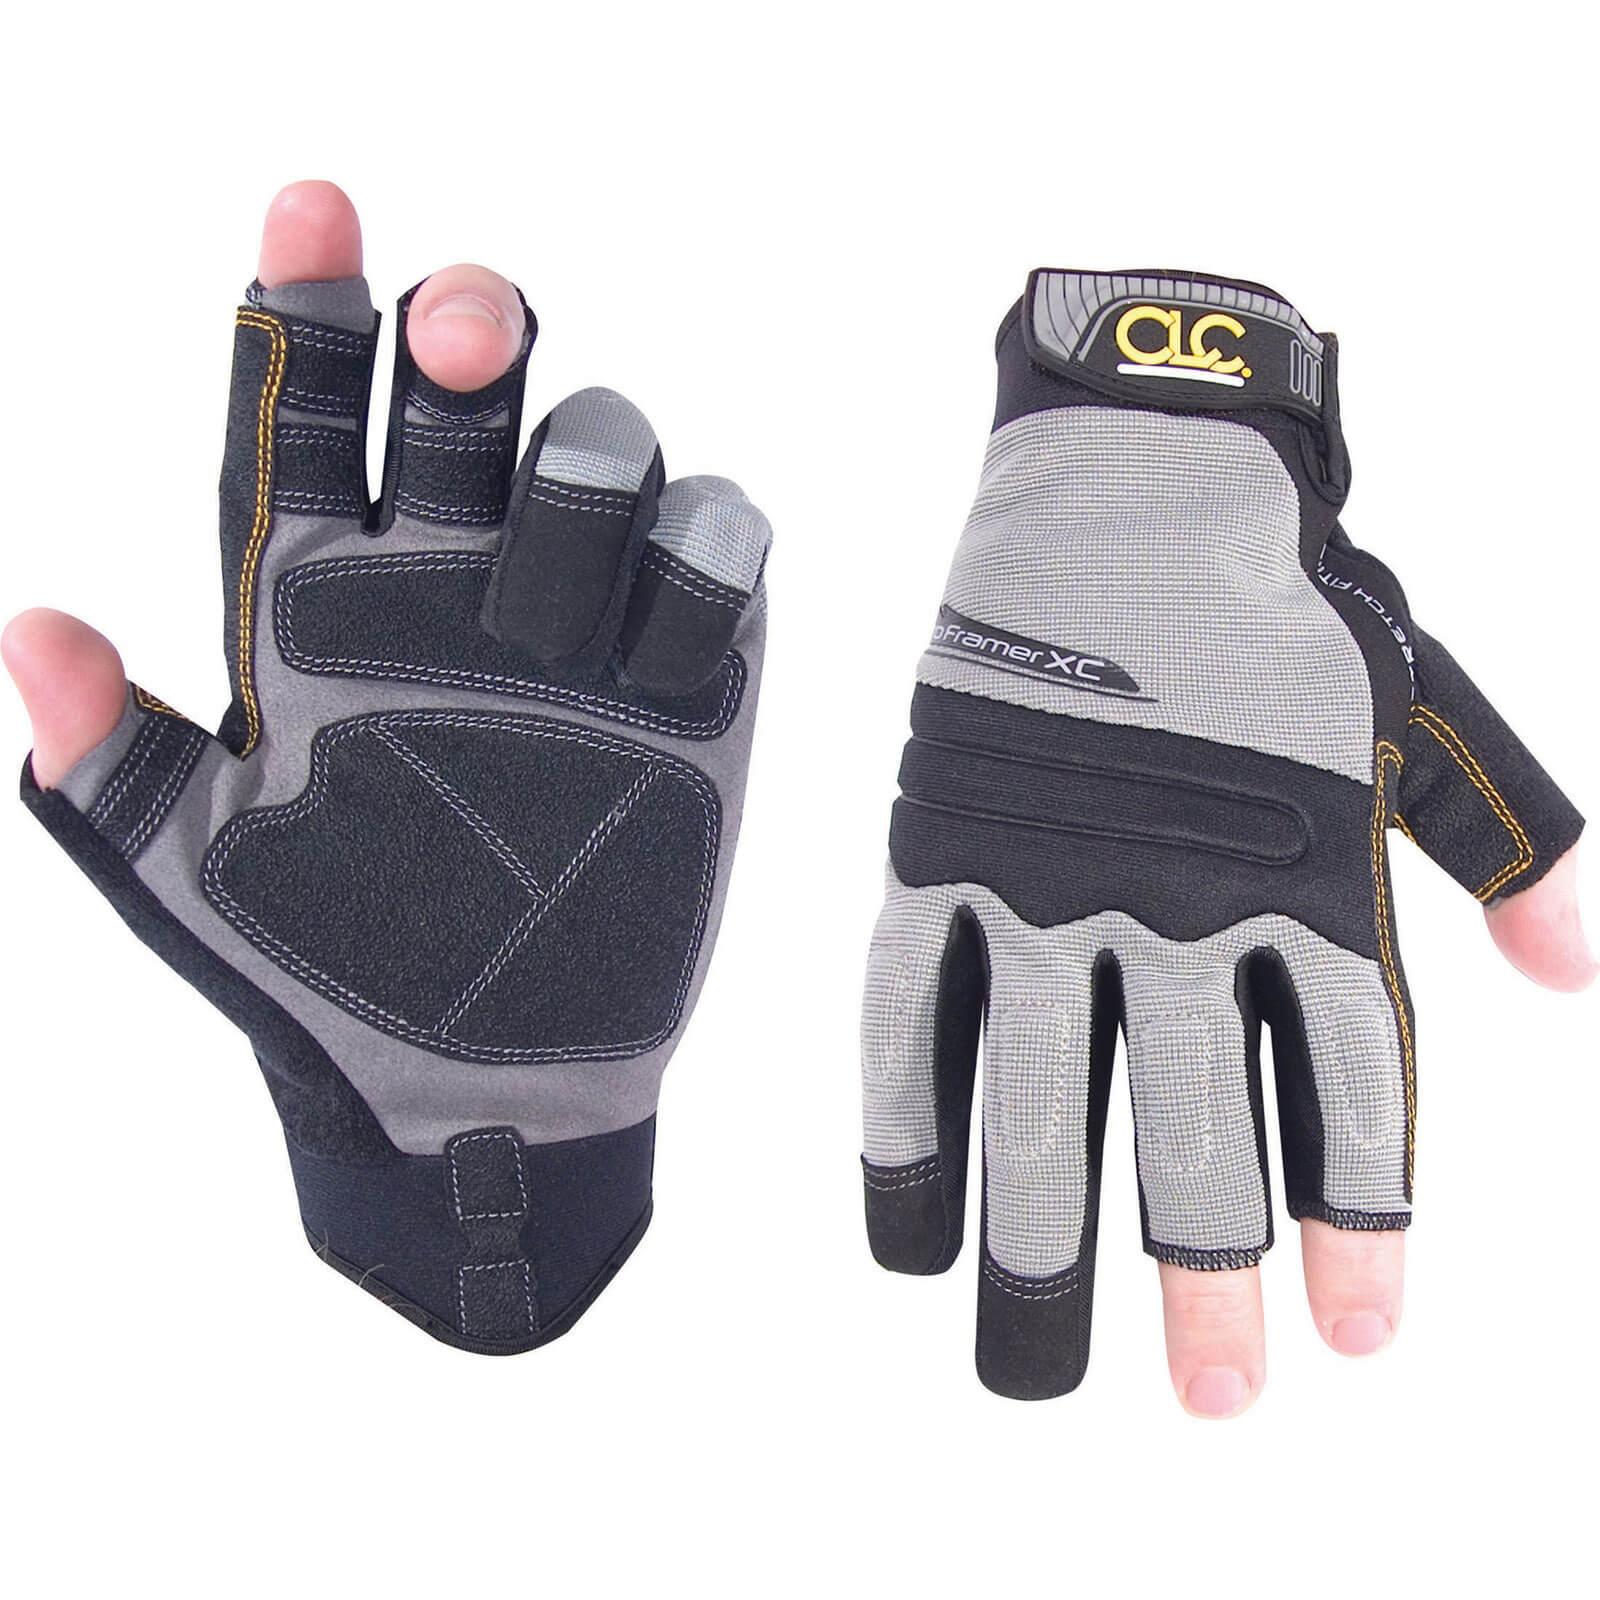 Kunys Flex Grip Pro Framer Gloves M